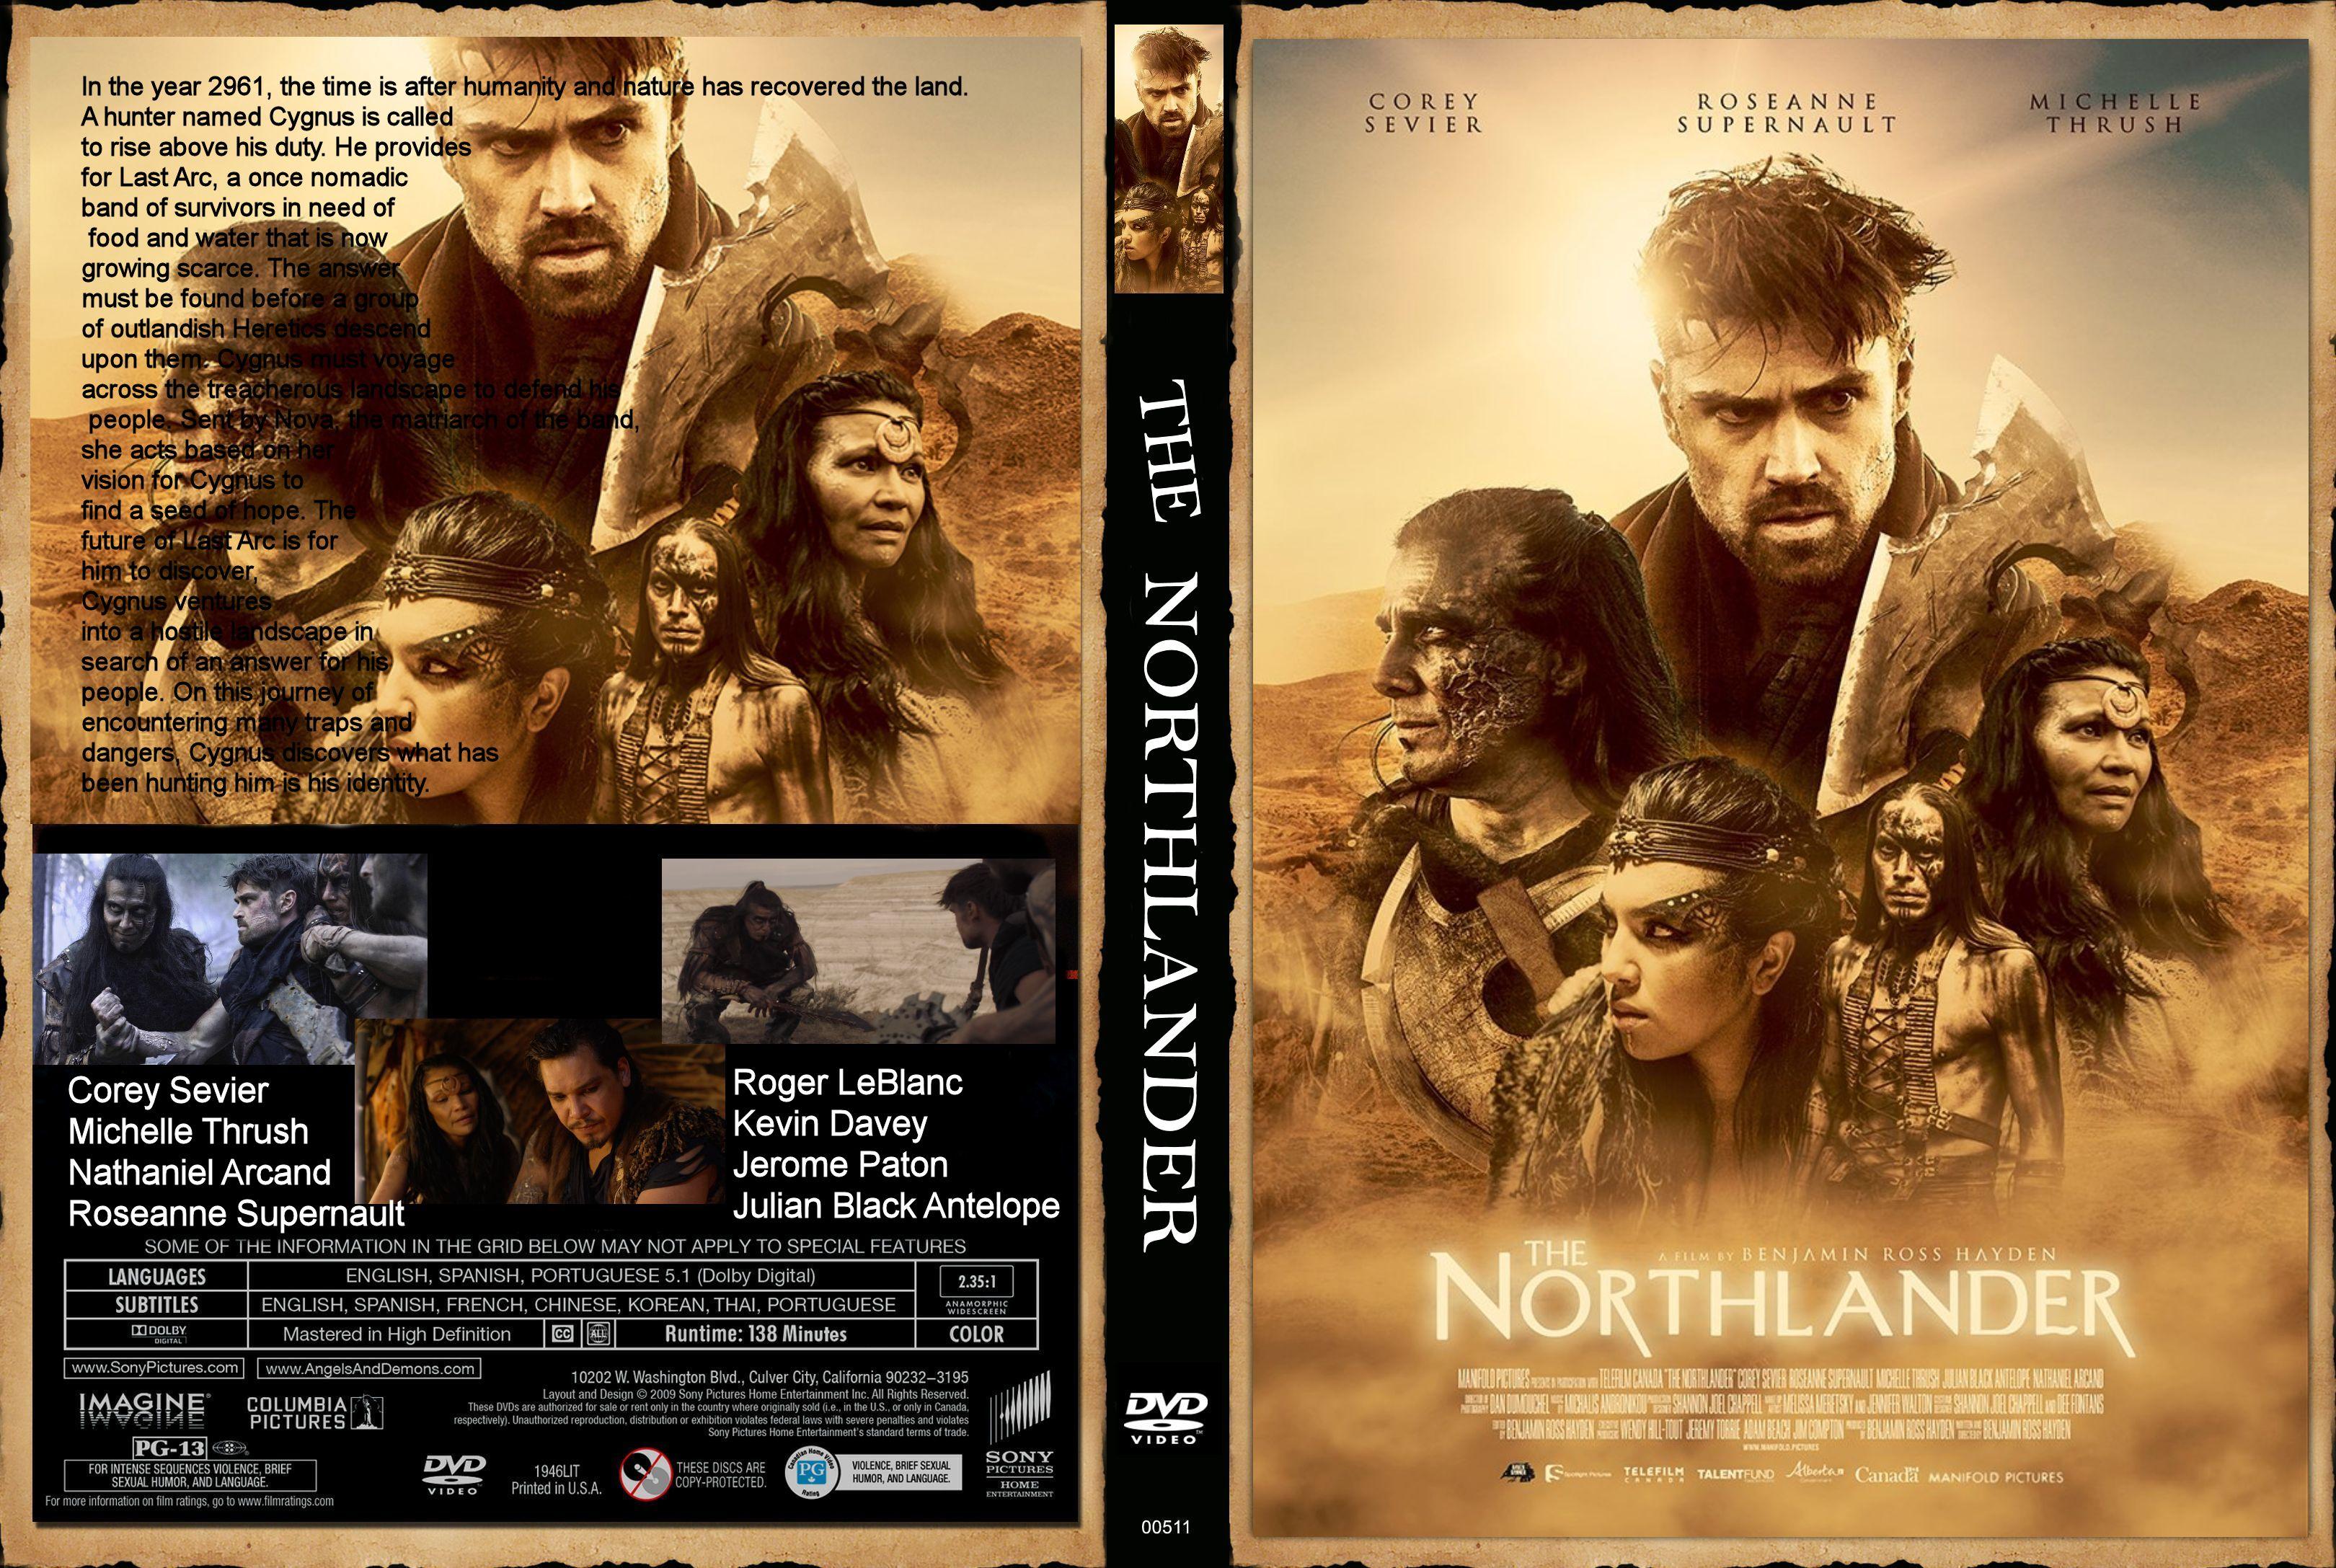 the northlander full movie